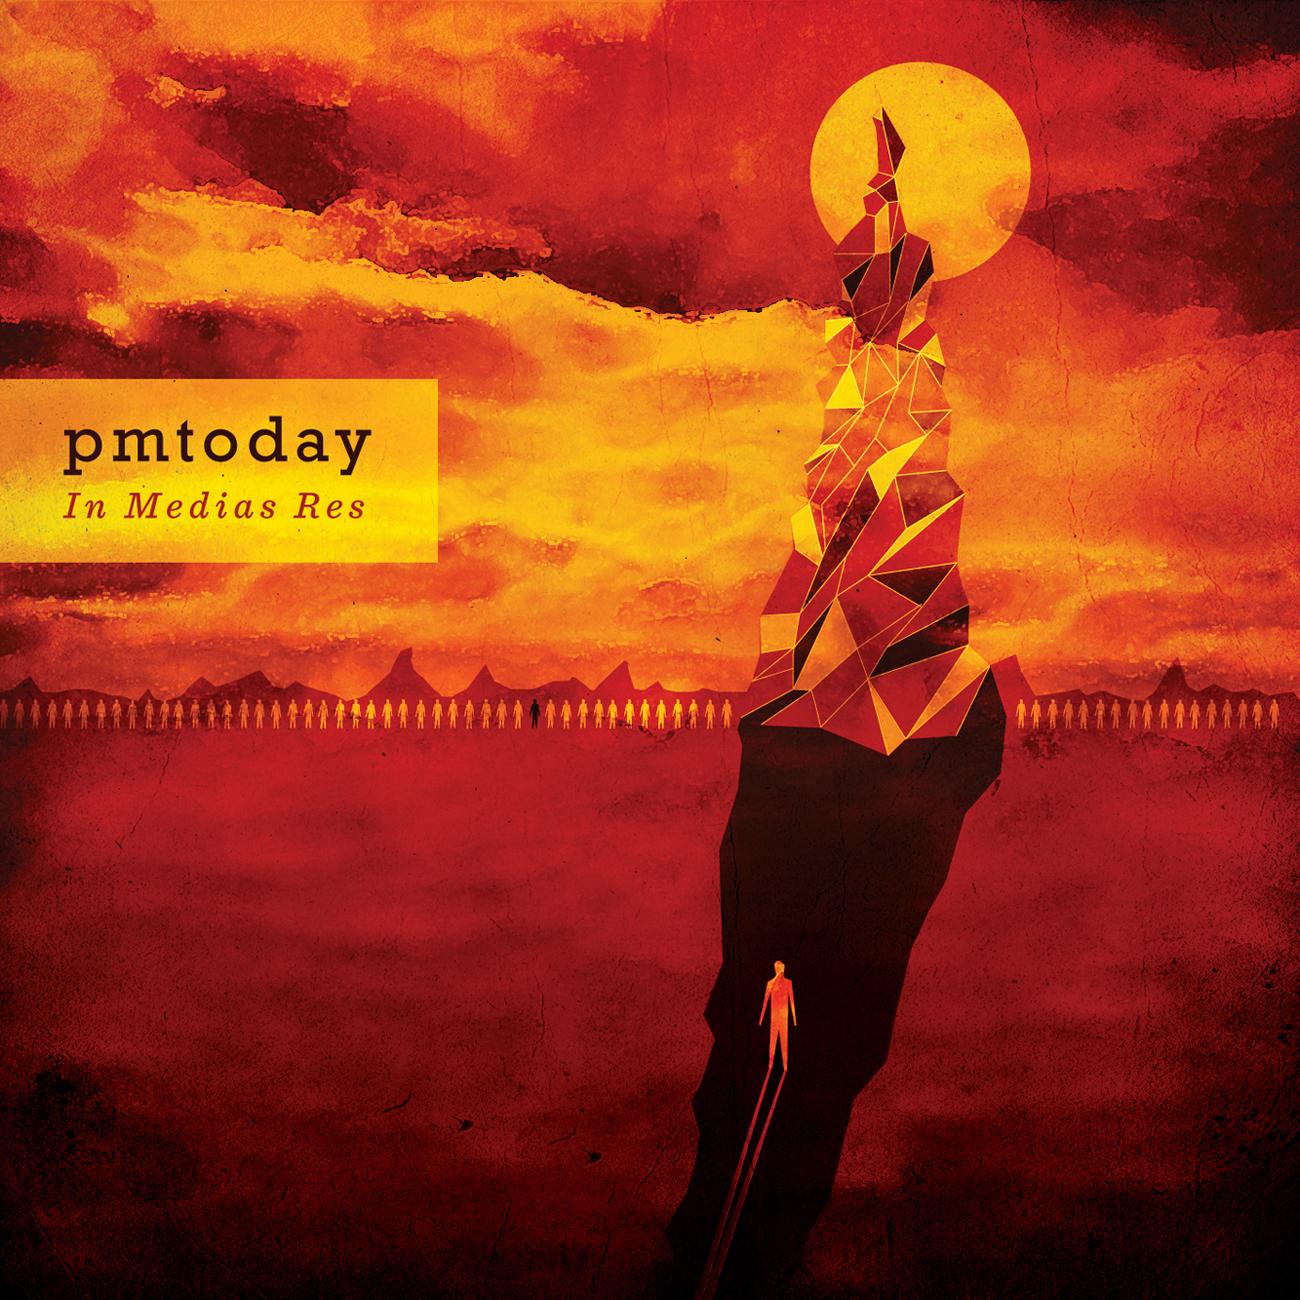 PMtoday - In Medias Res 12